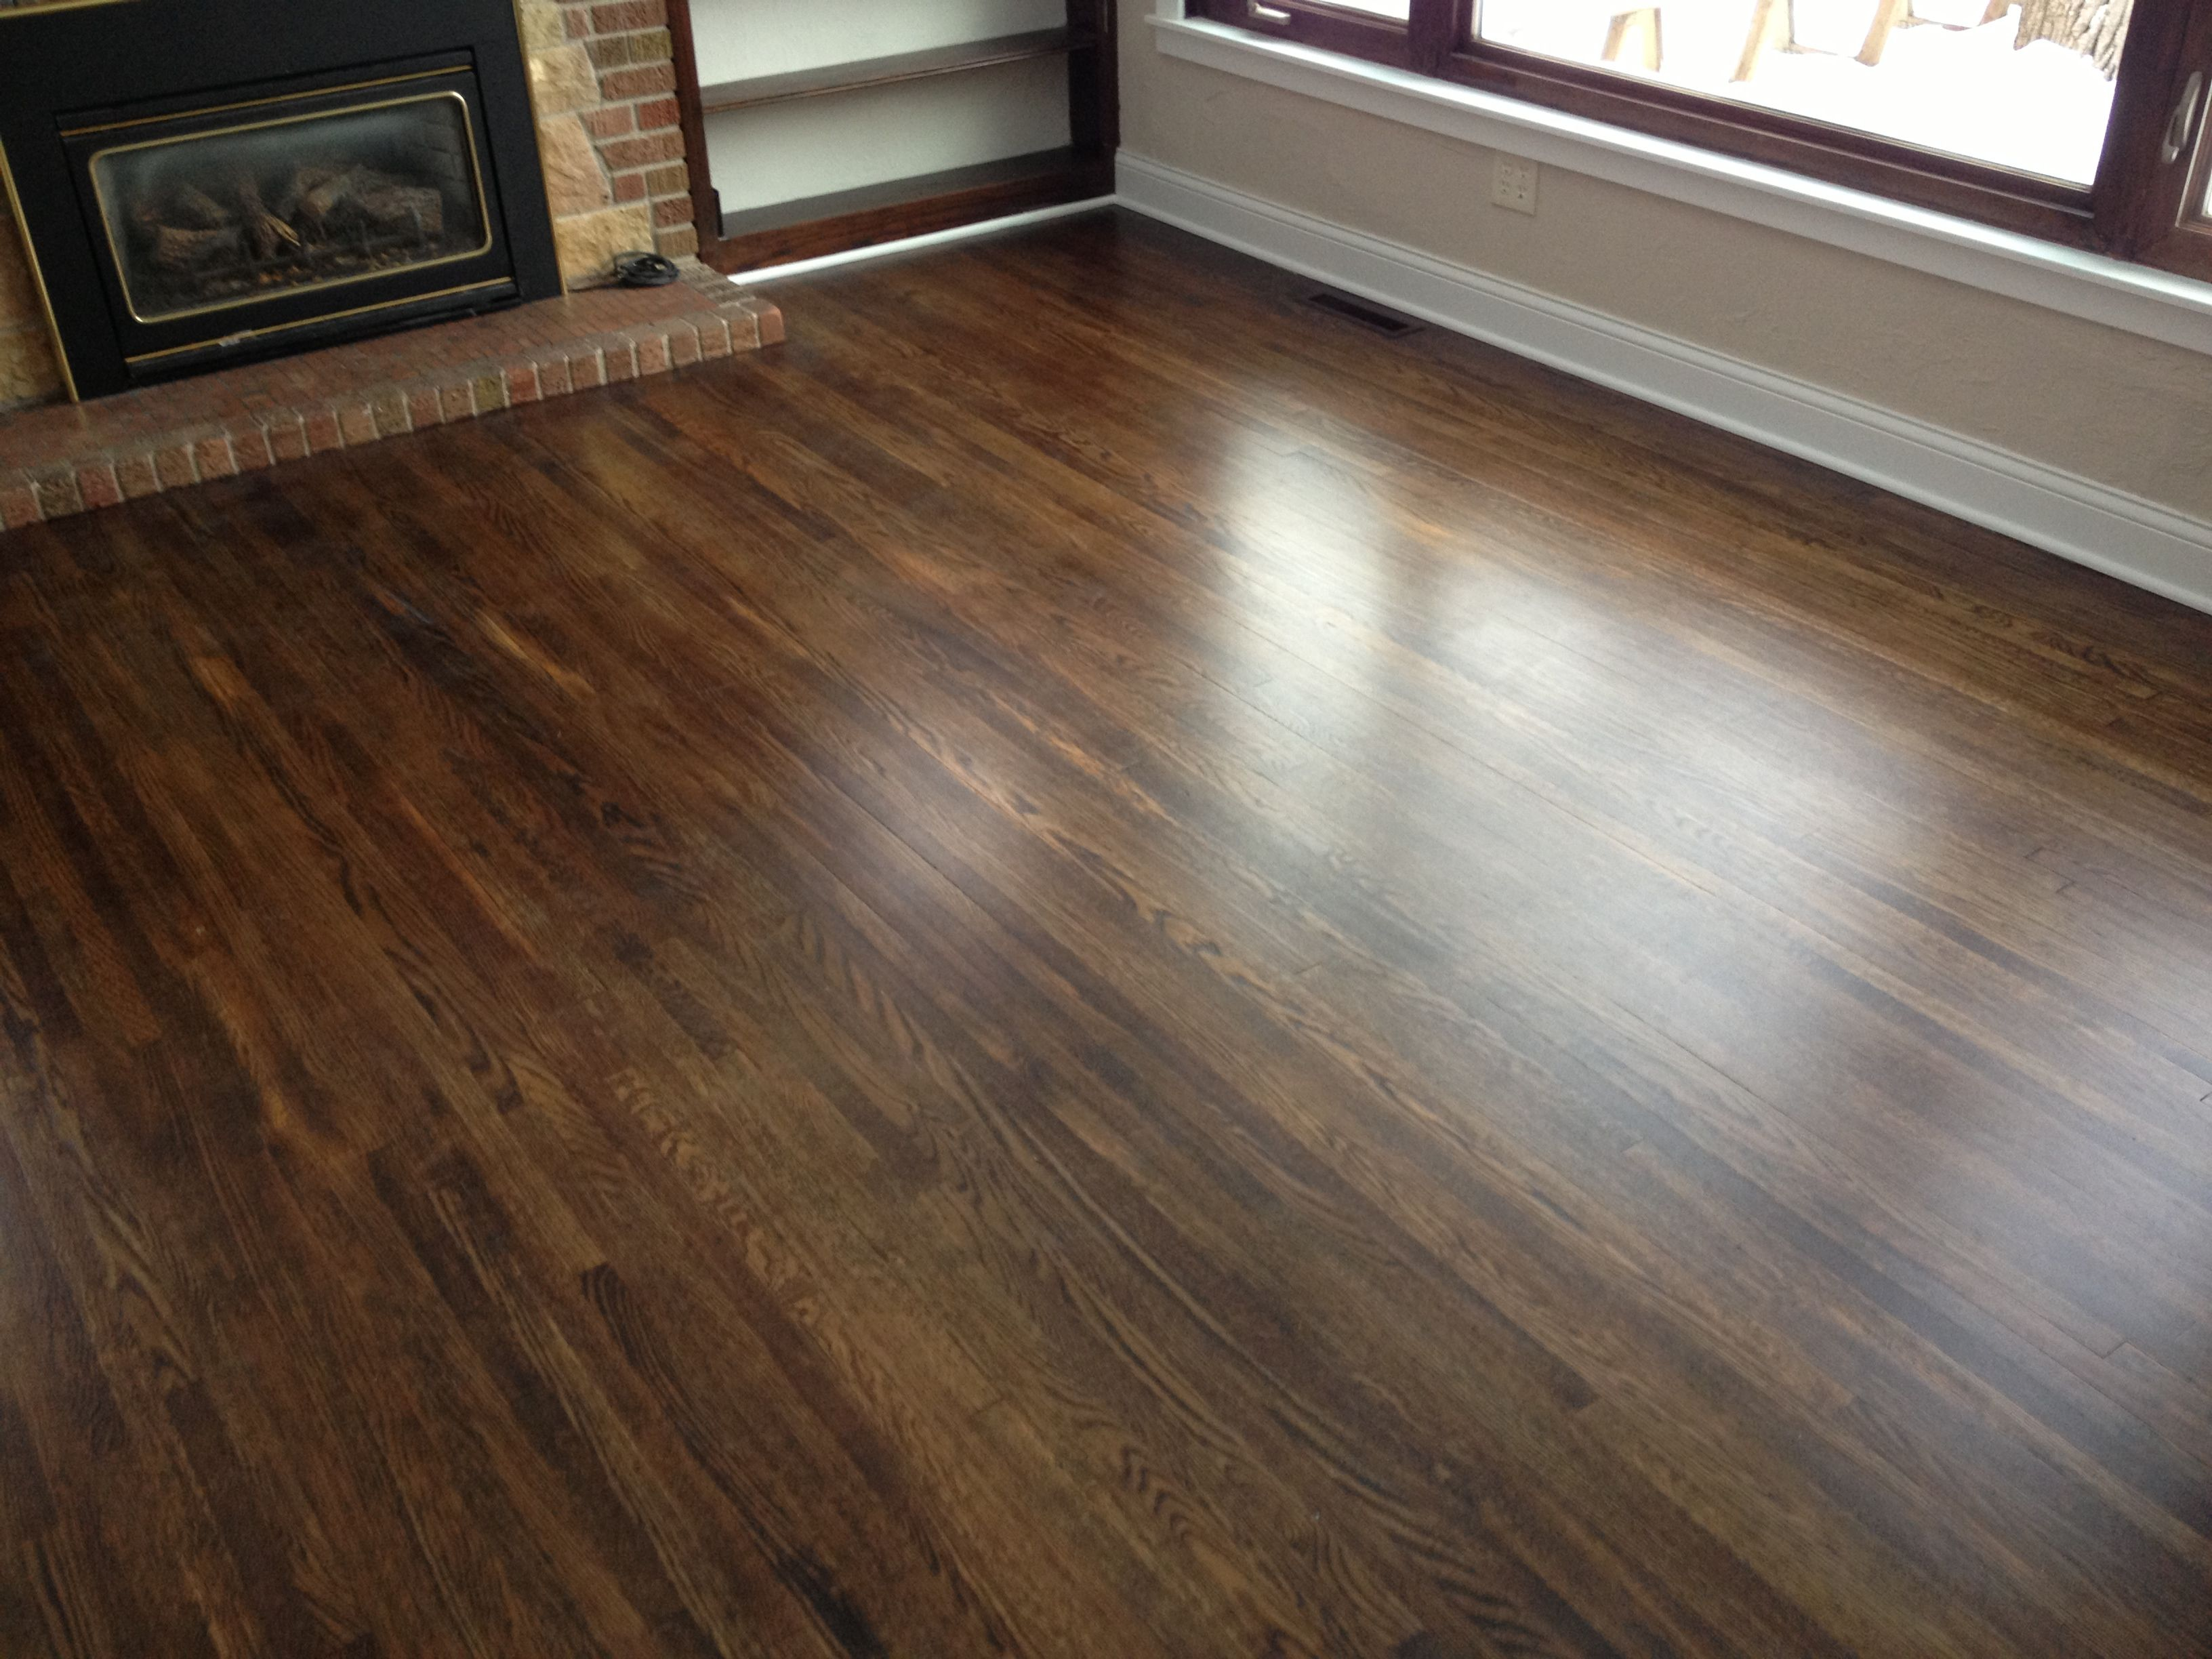 Great Methods to Use for Refinishing Hardwood Floors  Let